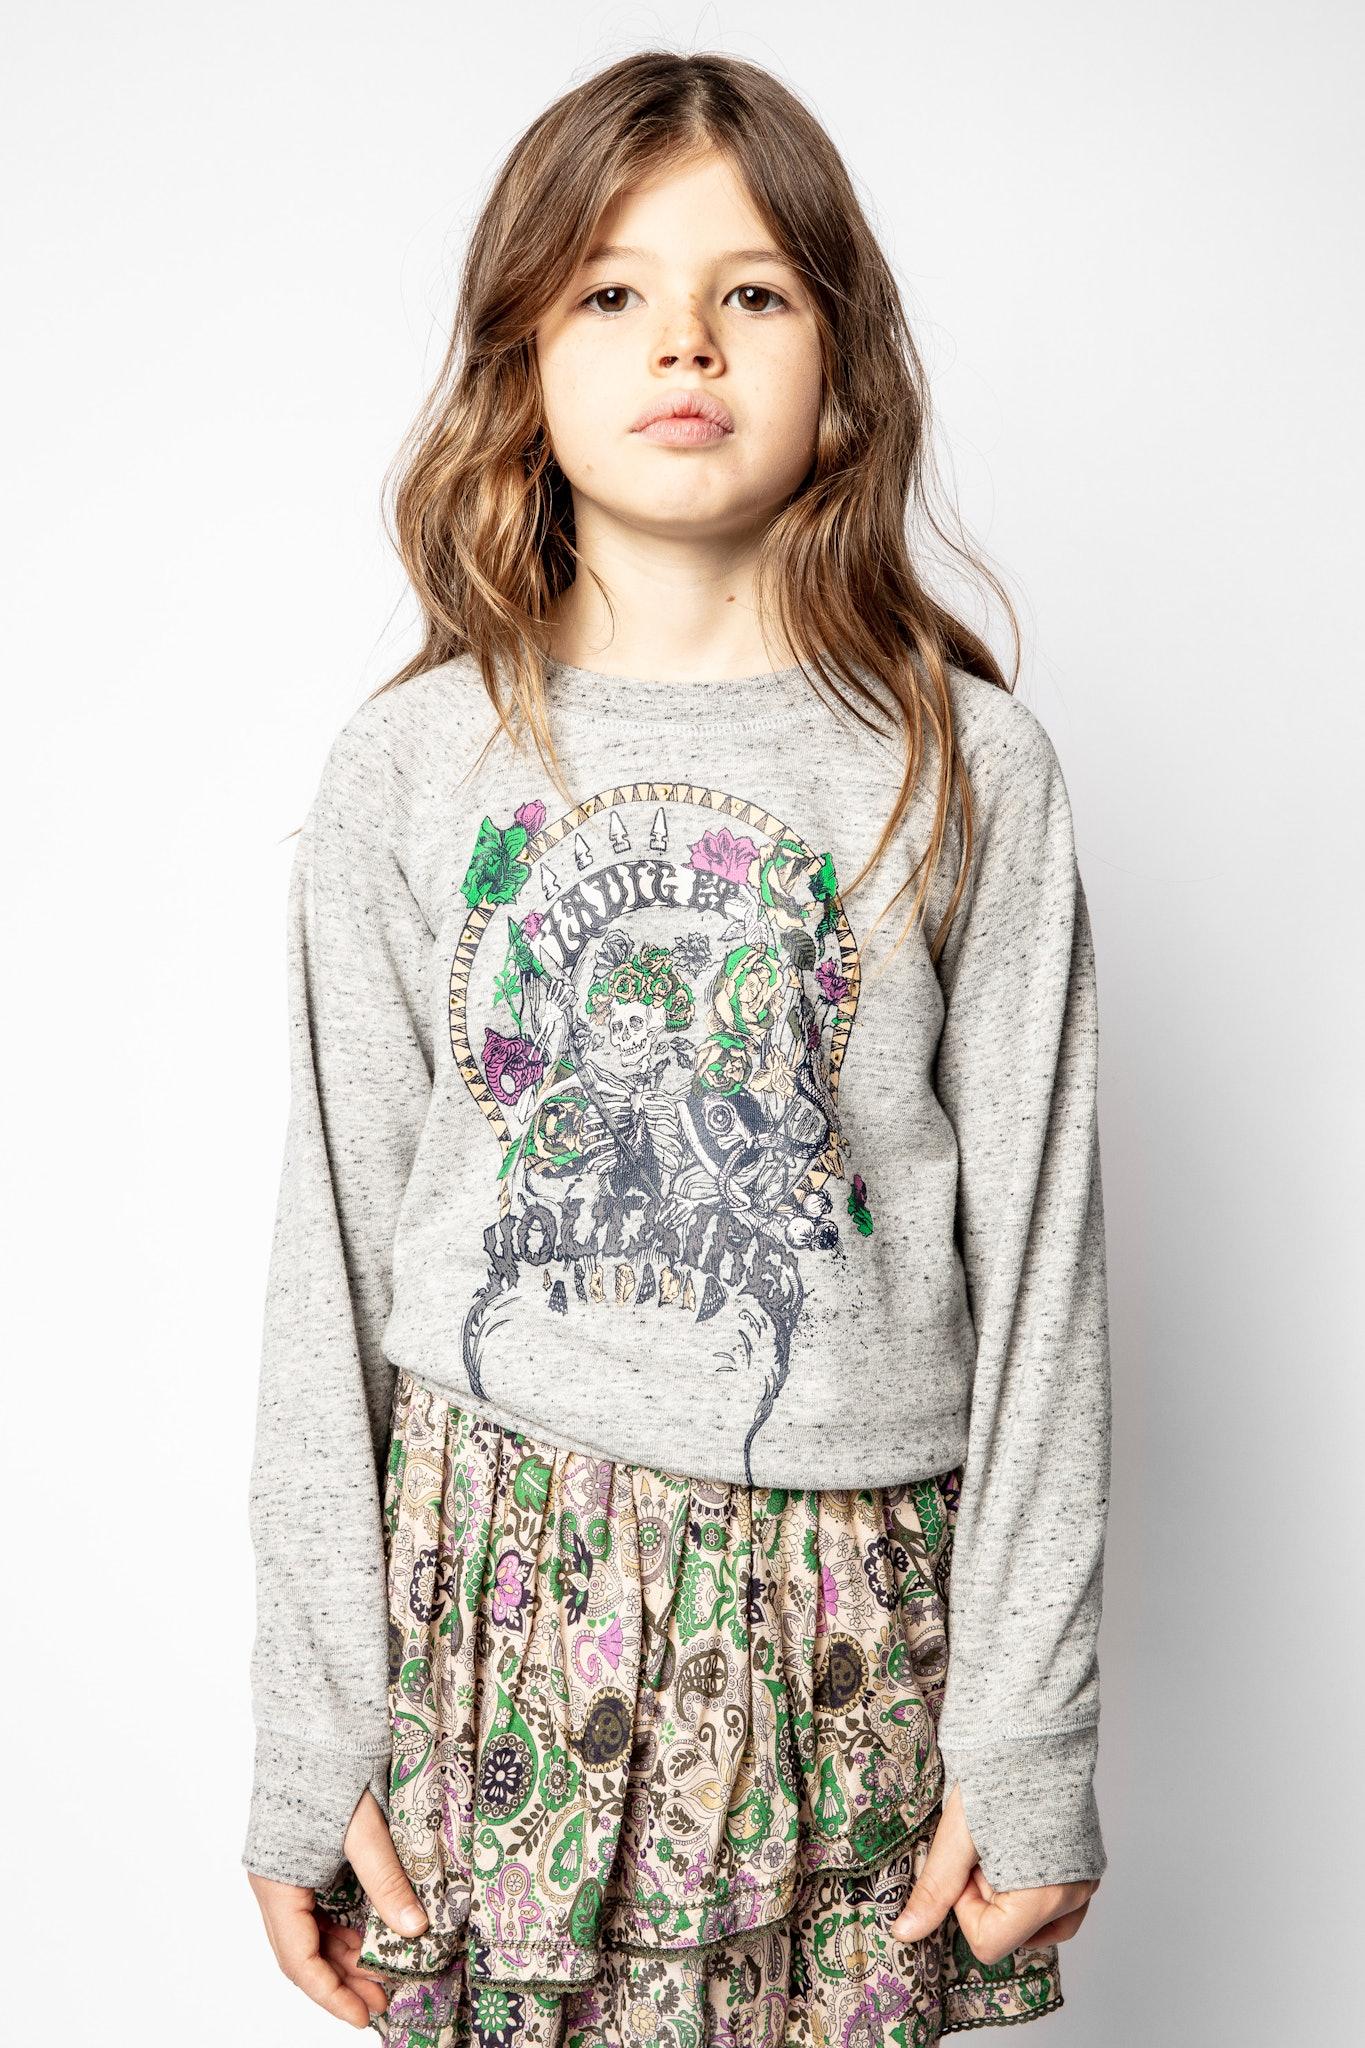 Child's Fame sweatshirt